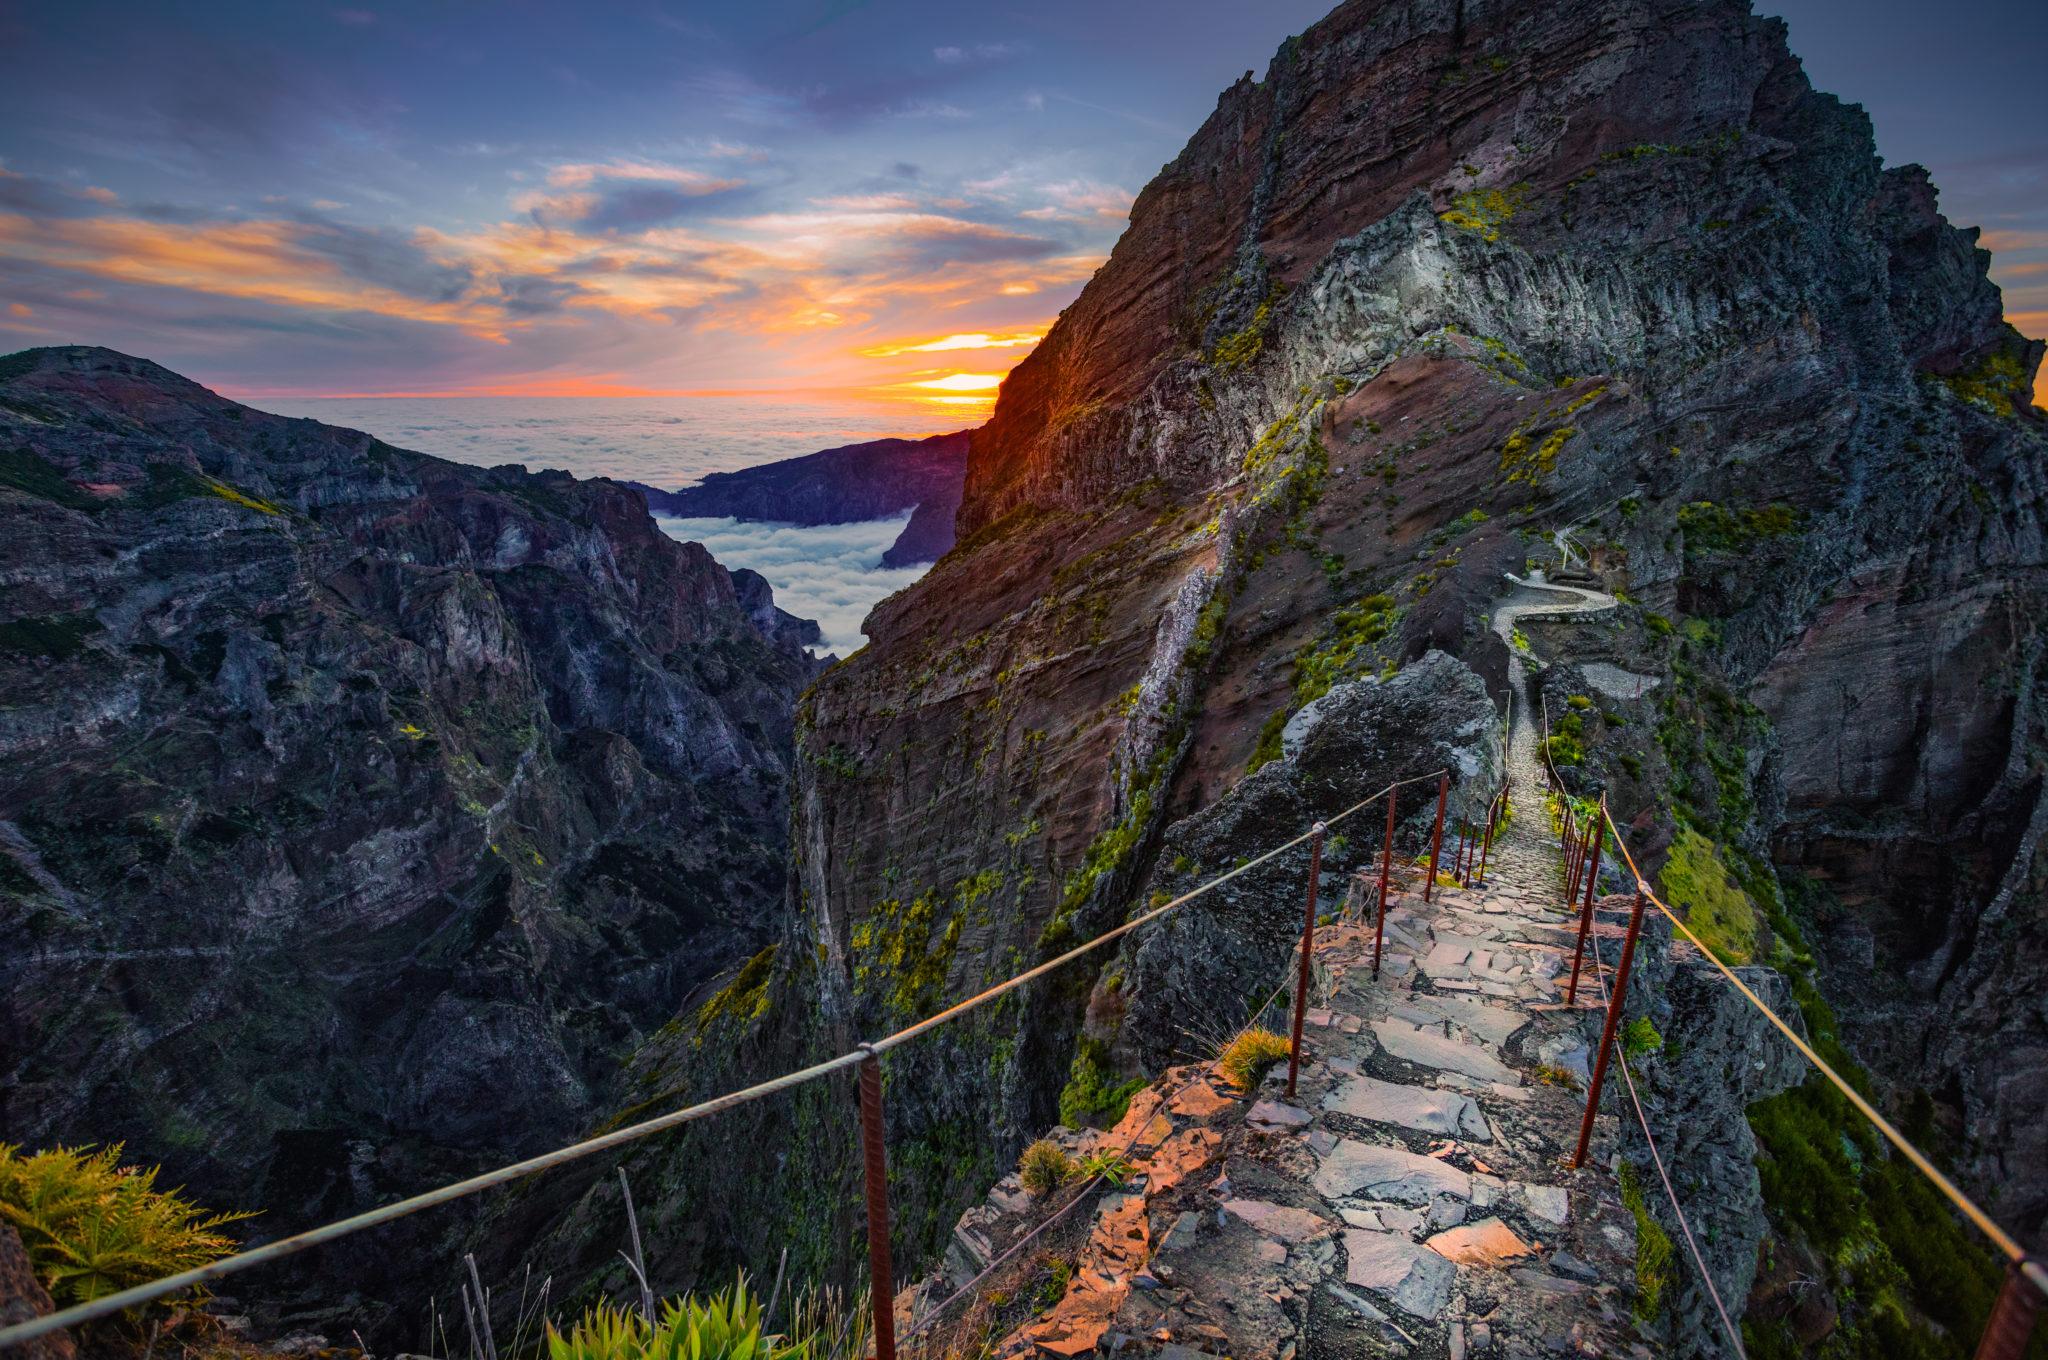 Madeiras faszinierende Landschaften